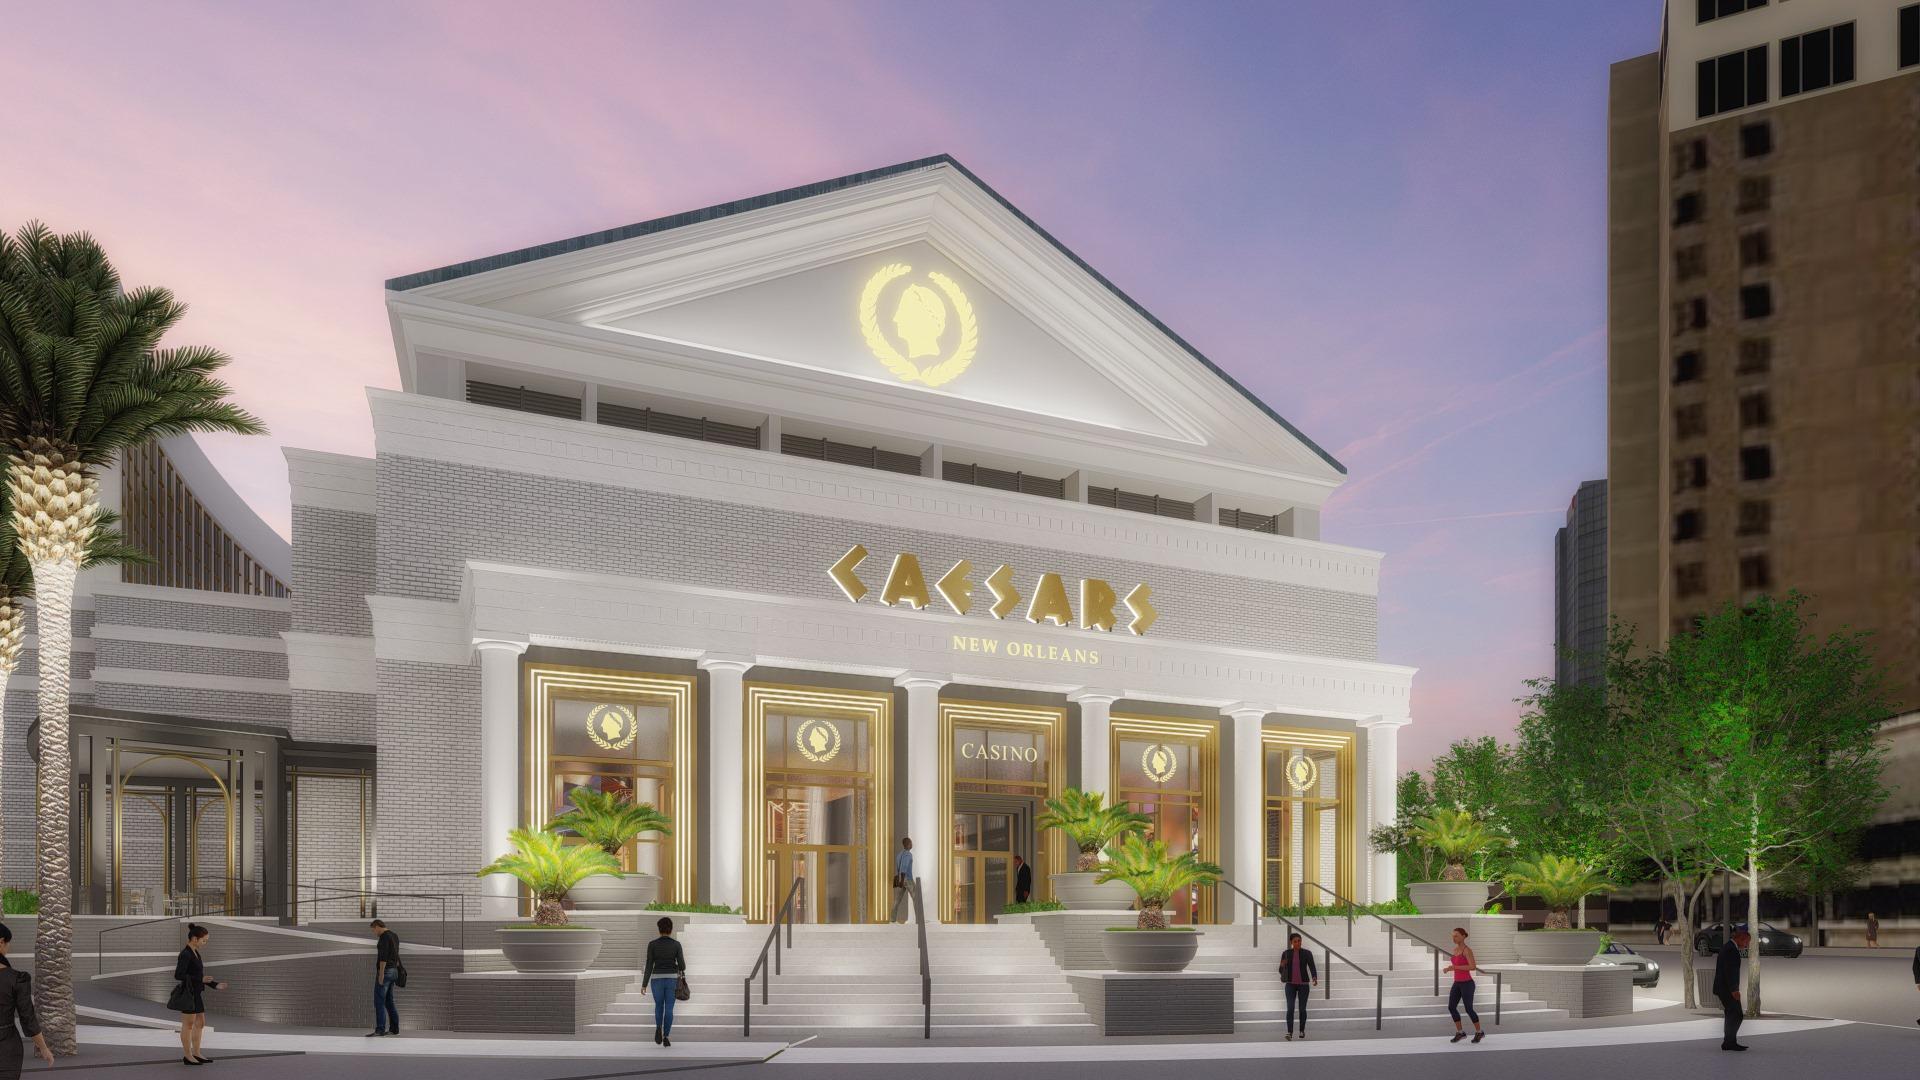 Harrahs casino baton rouge la new uk online slots